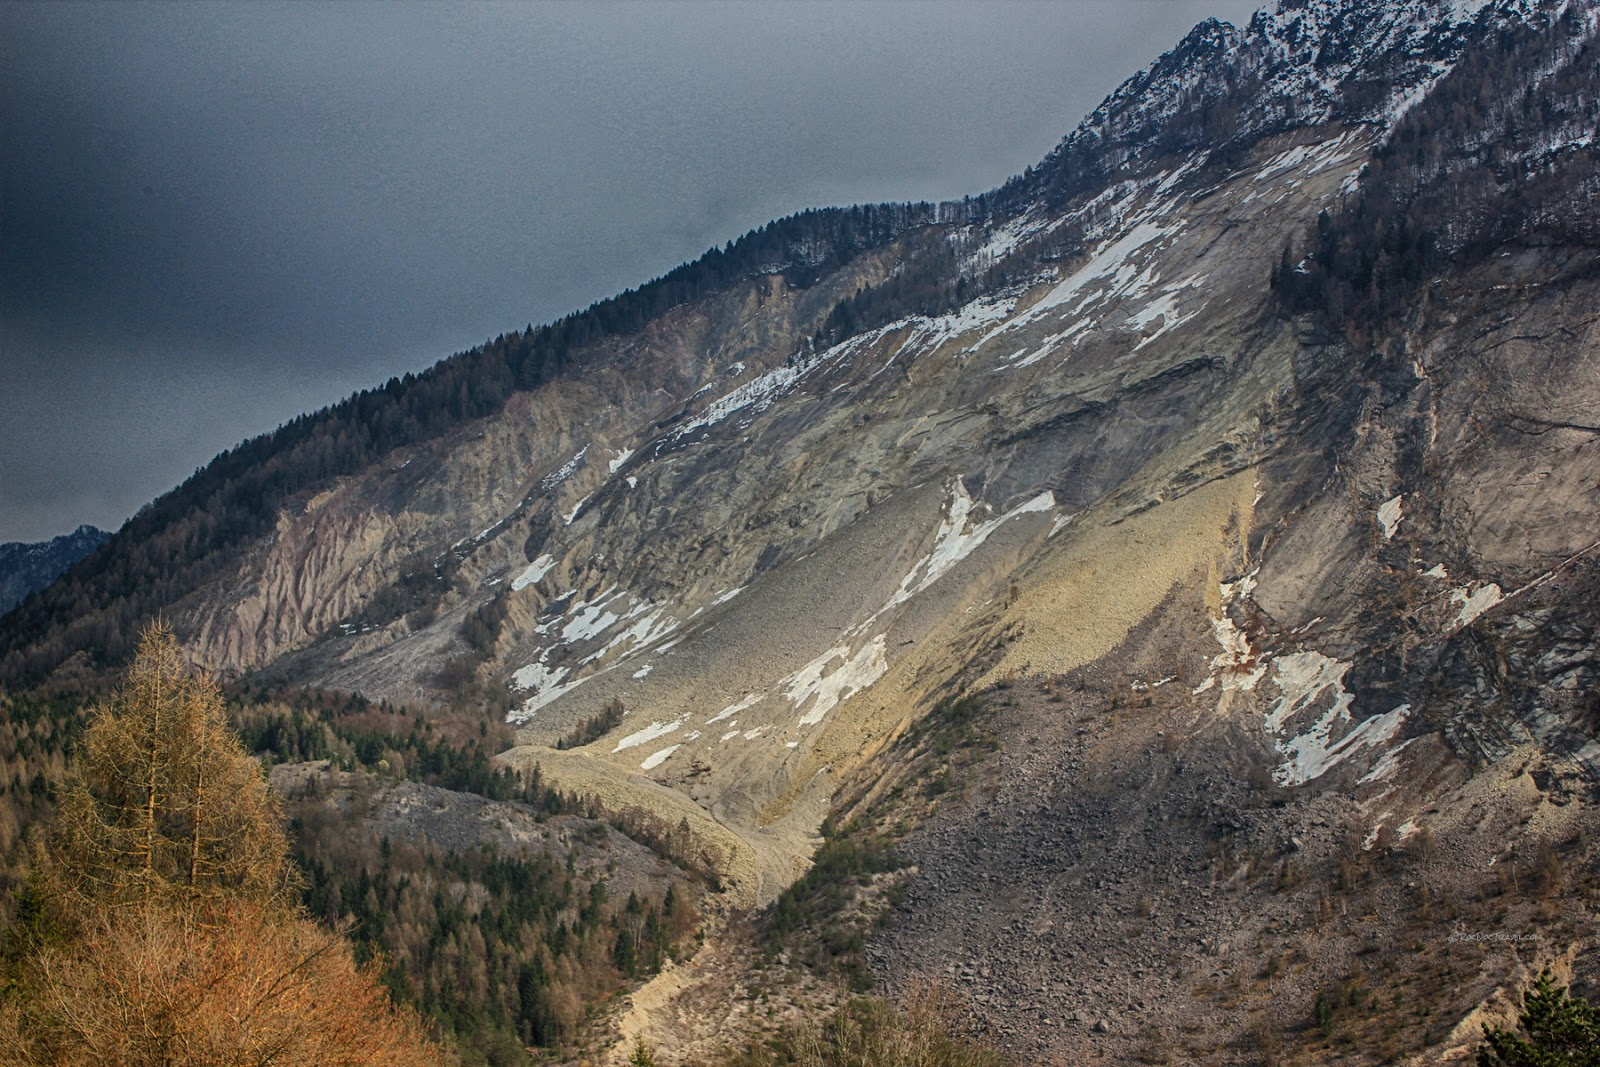 Vaiont dam landslide disaster Italy 1963 flood geology travel trip tour copyright rocdoctravel.com